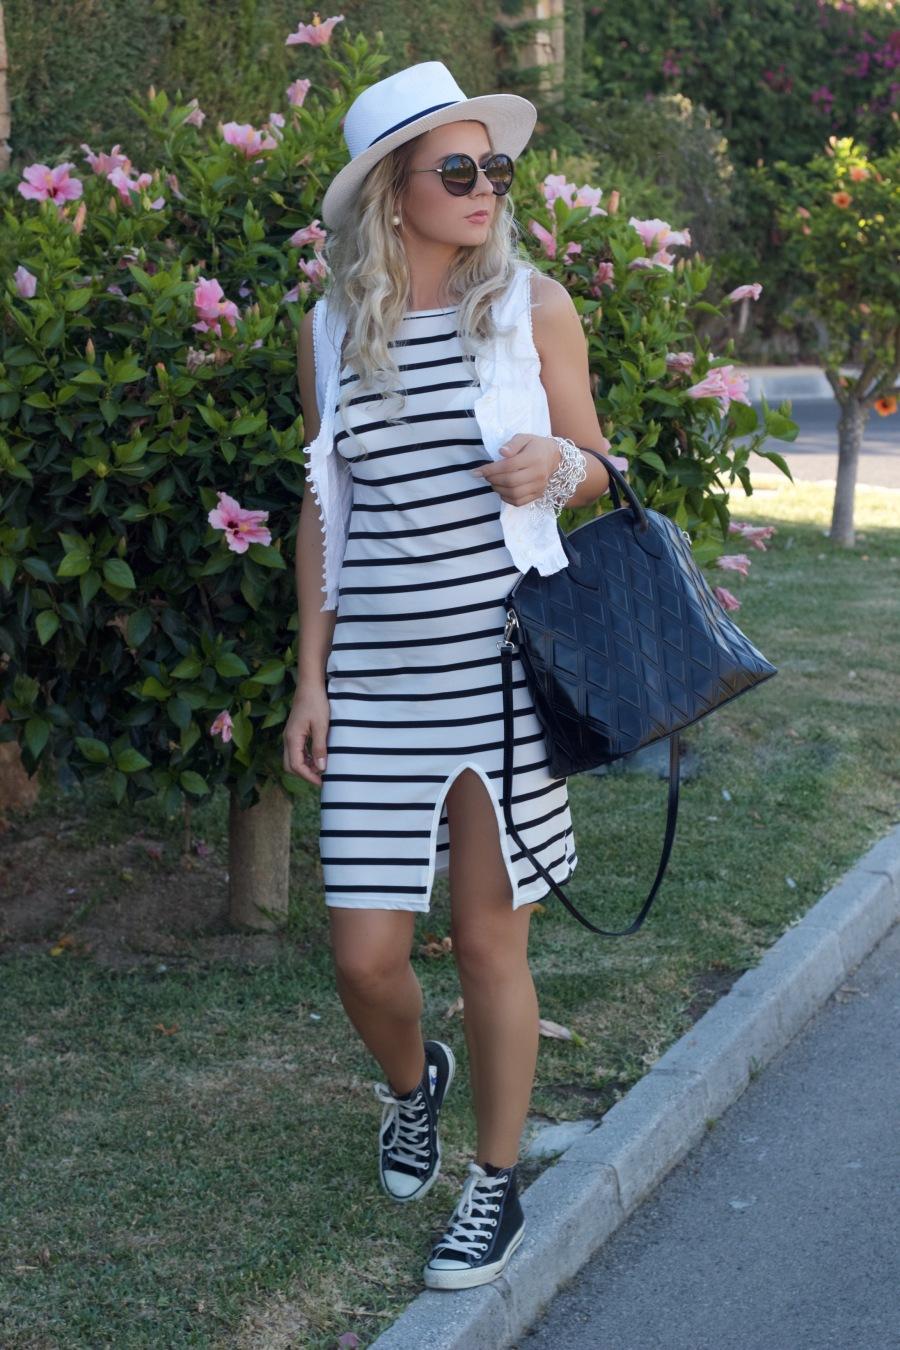 whitestripeddress marbellafashion mbcosblog fashion streestyle dresslinkdress